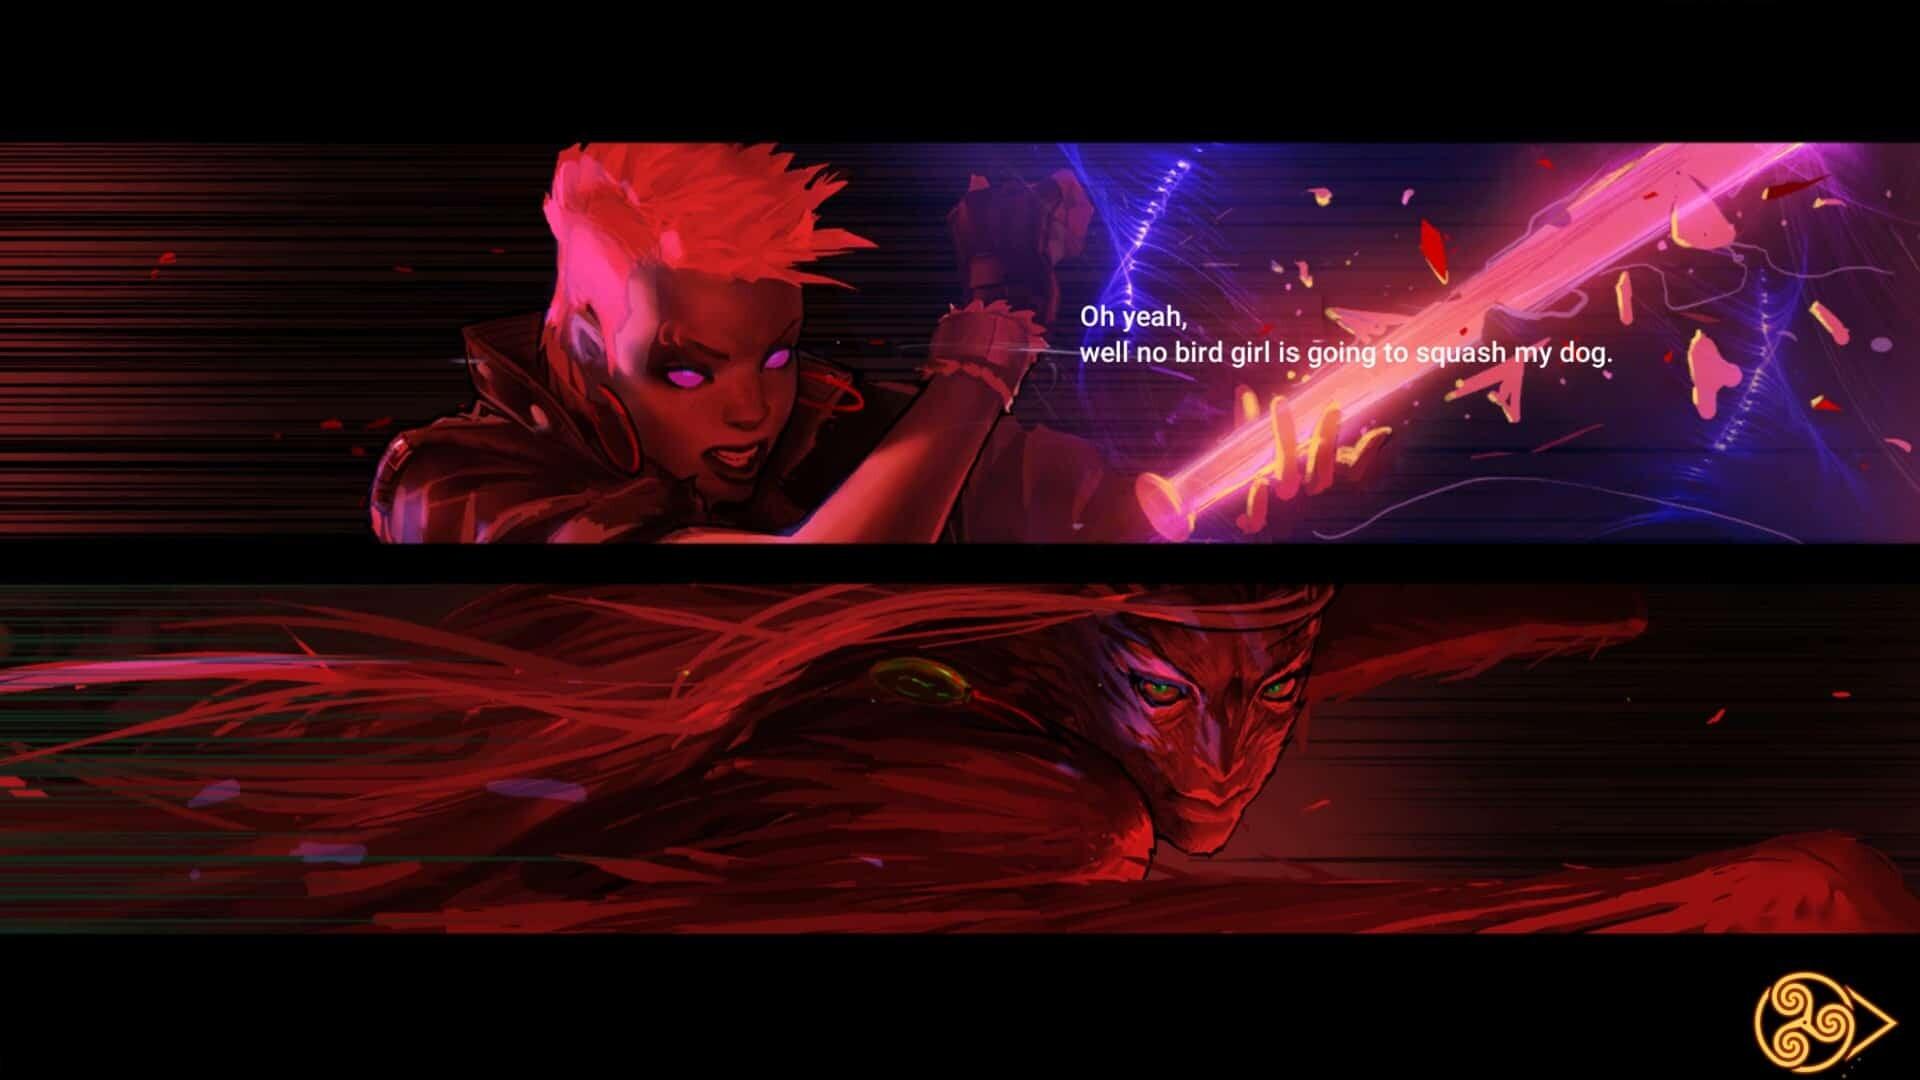 Mythgard screenshot - pink and purple women warriors in a cutscene